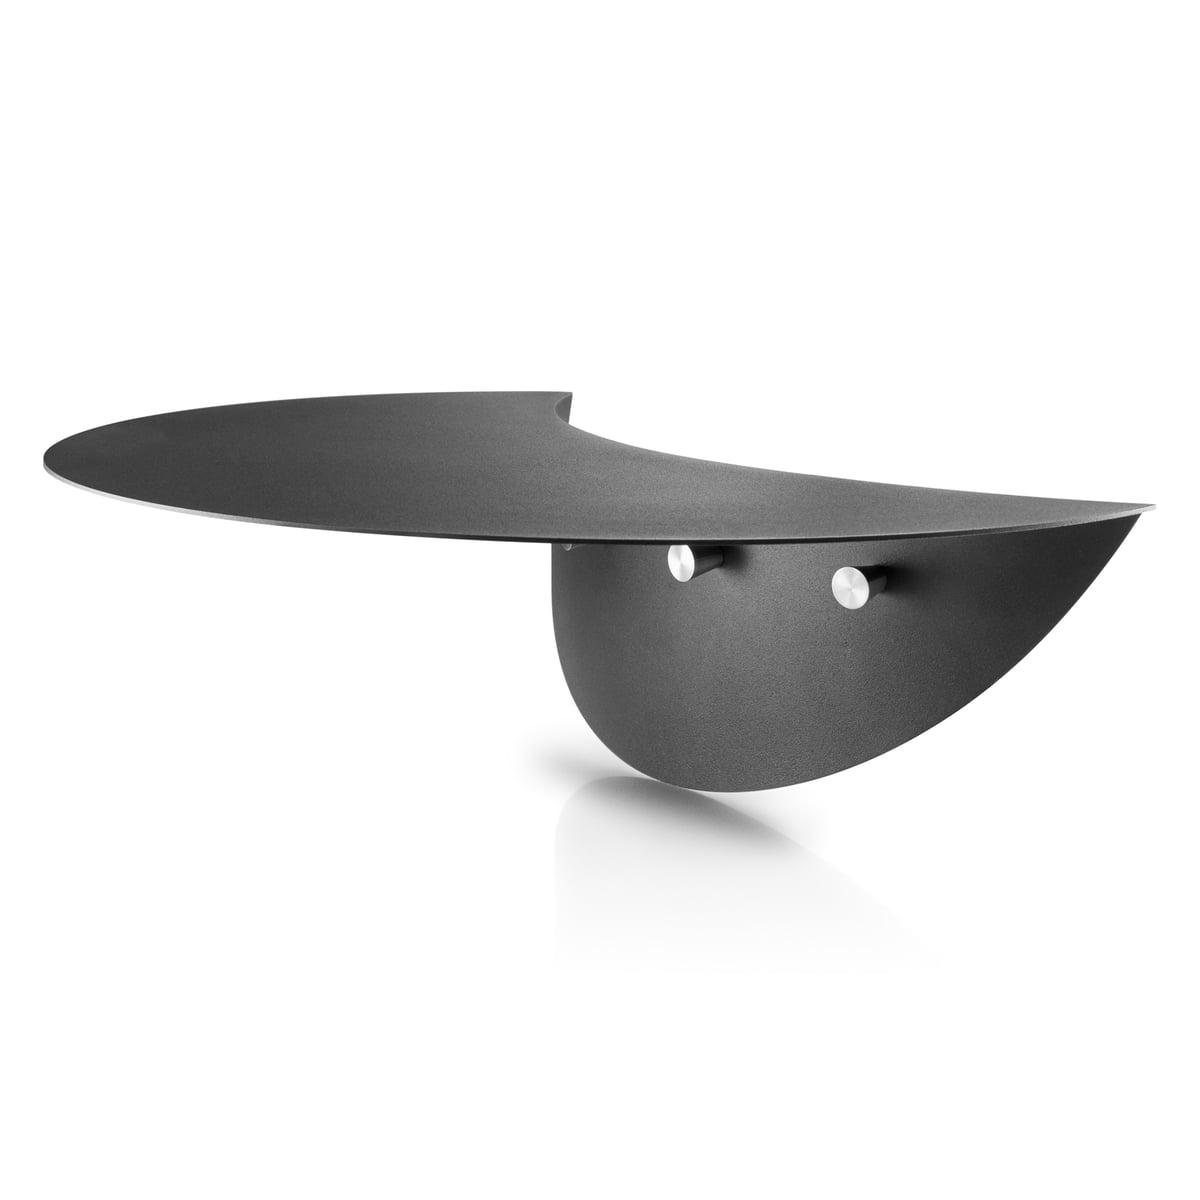 Eva Solo - Grill side table Ø 59 cm